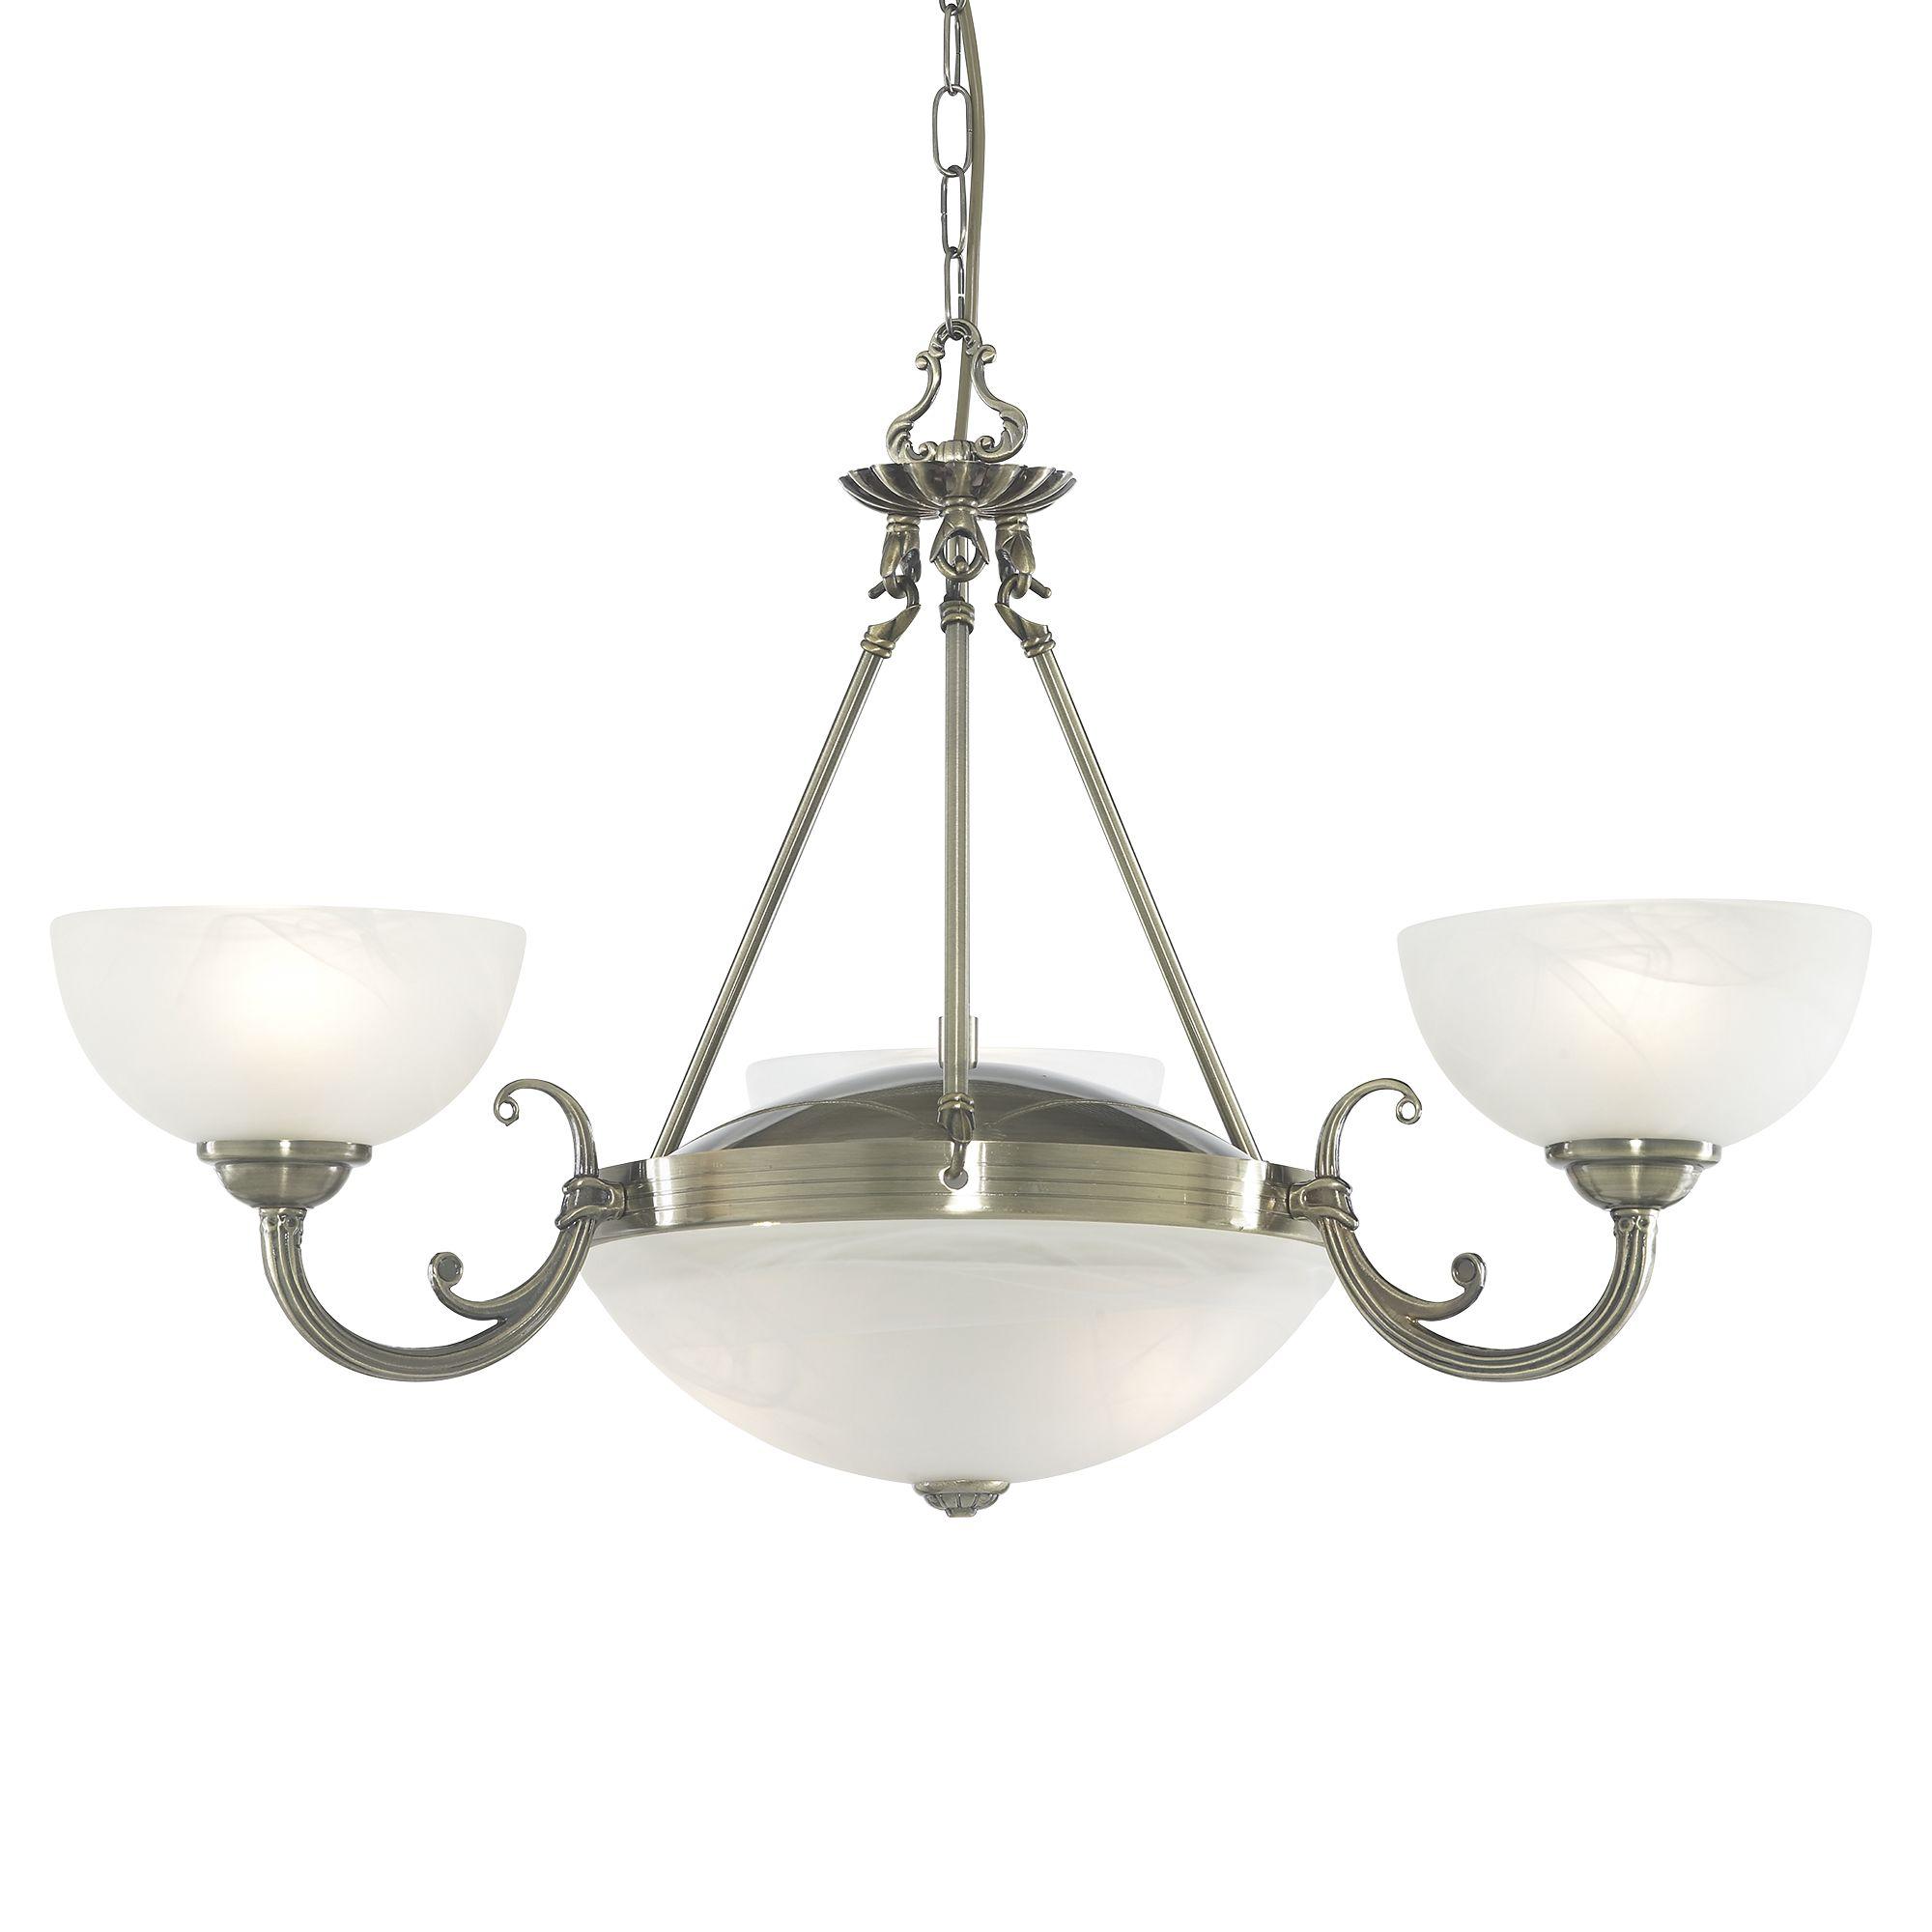 Windsor Antique Brass Wall Light Fitting Alabaster Glass Shade Interior Lights